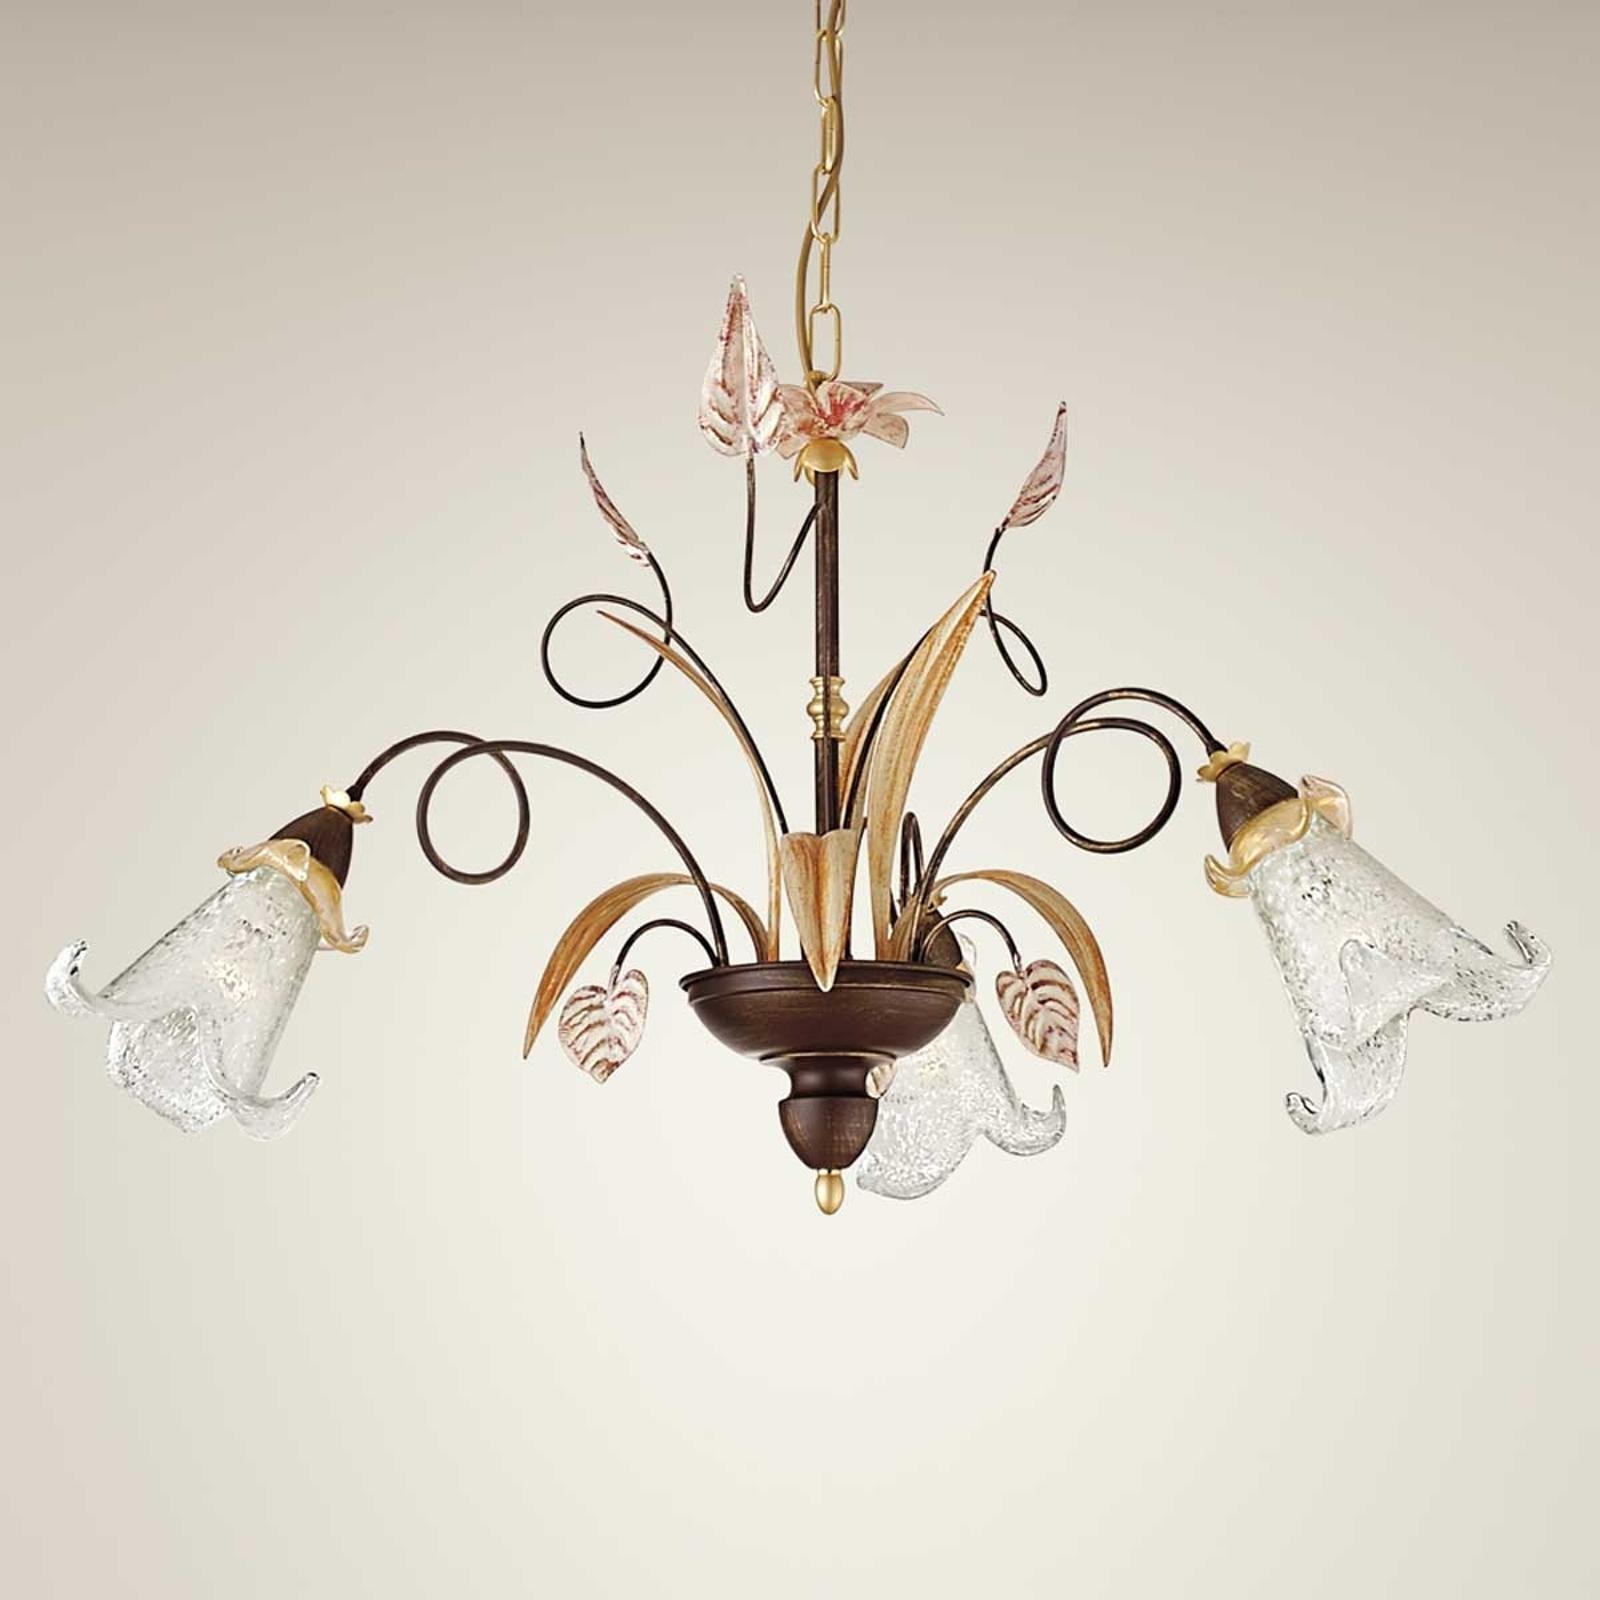 Giuseppe blomsterlignende hængelampe